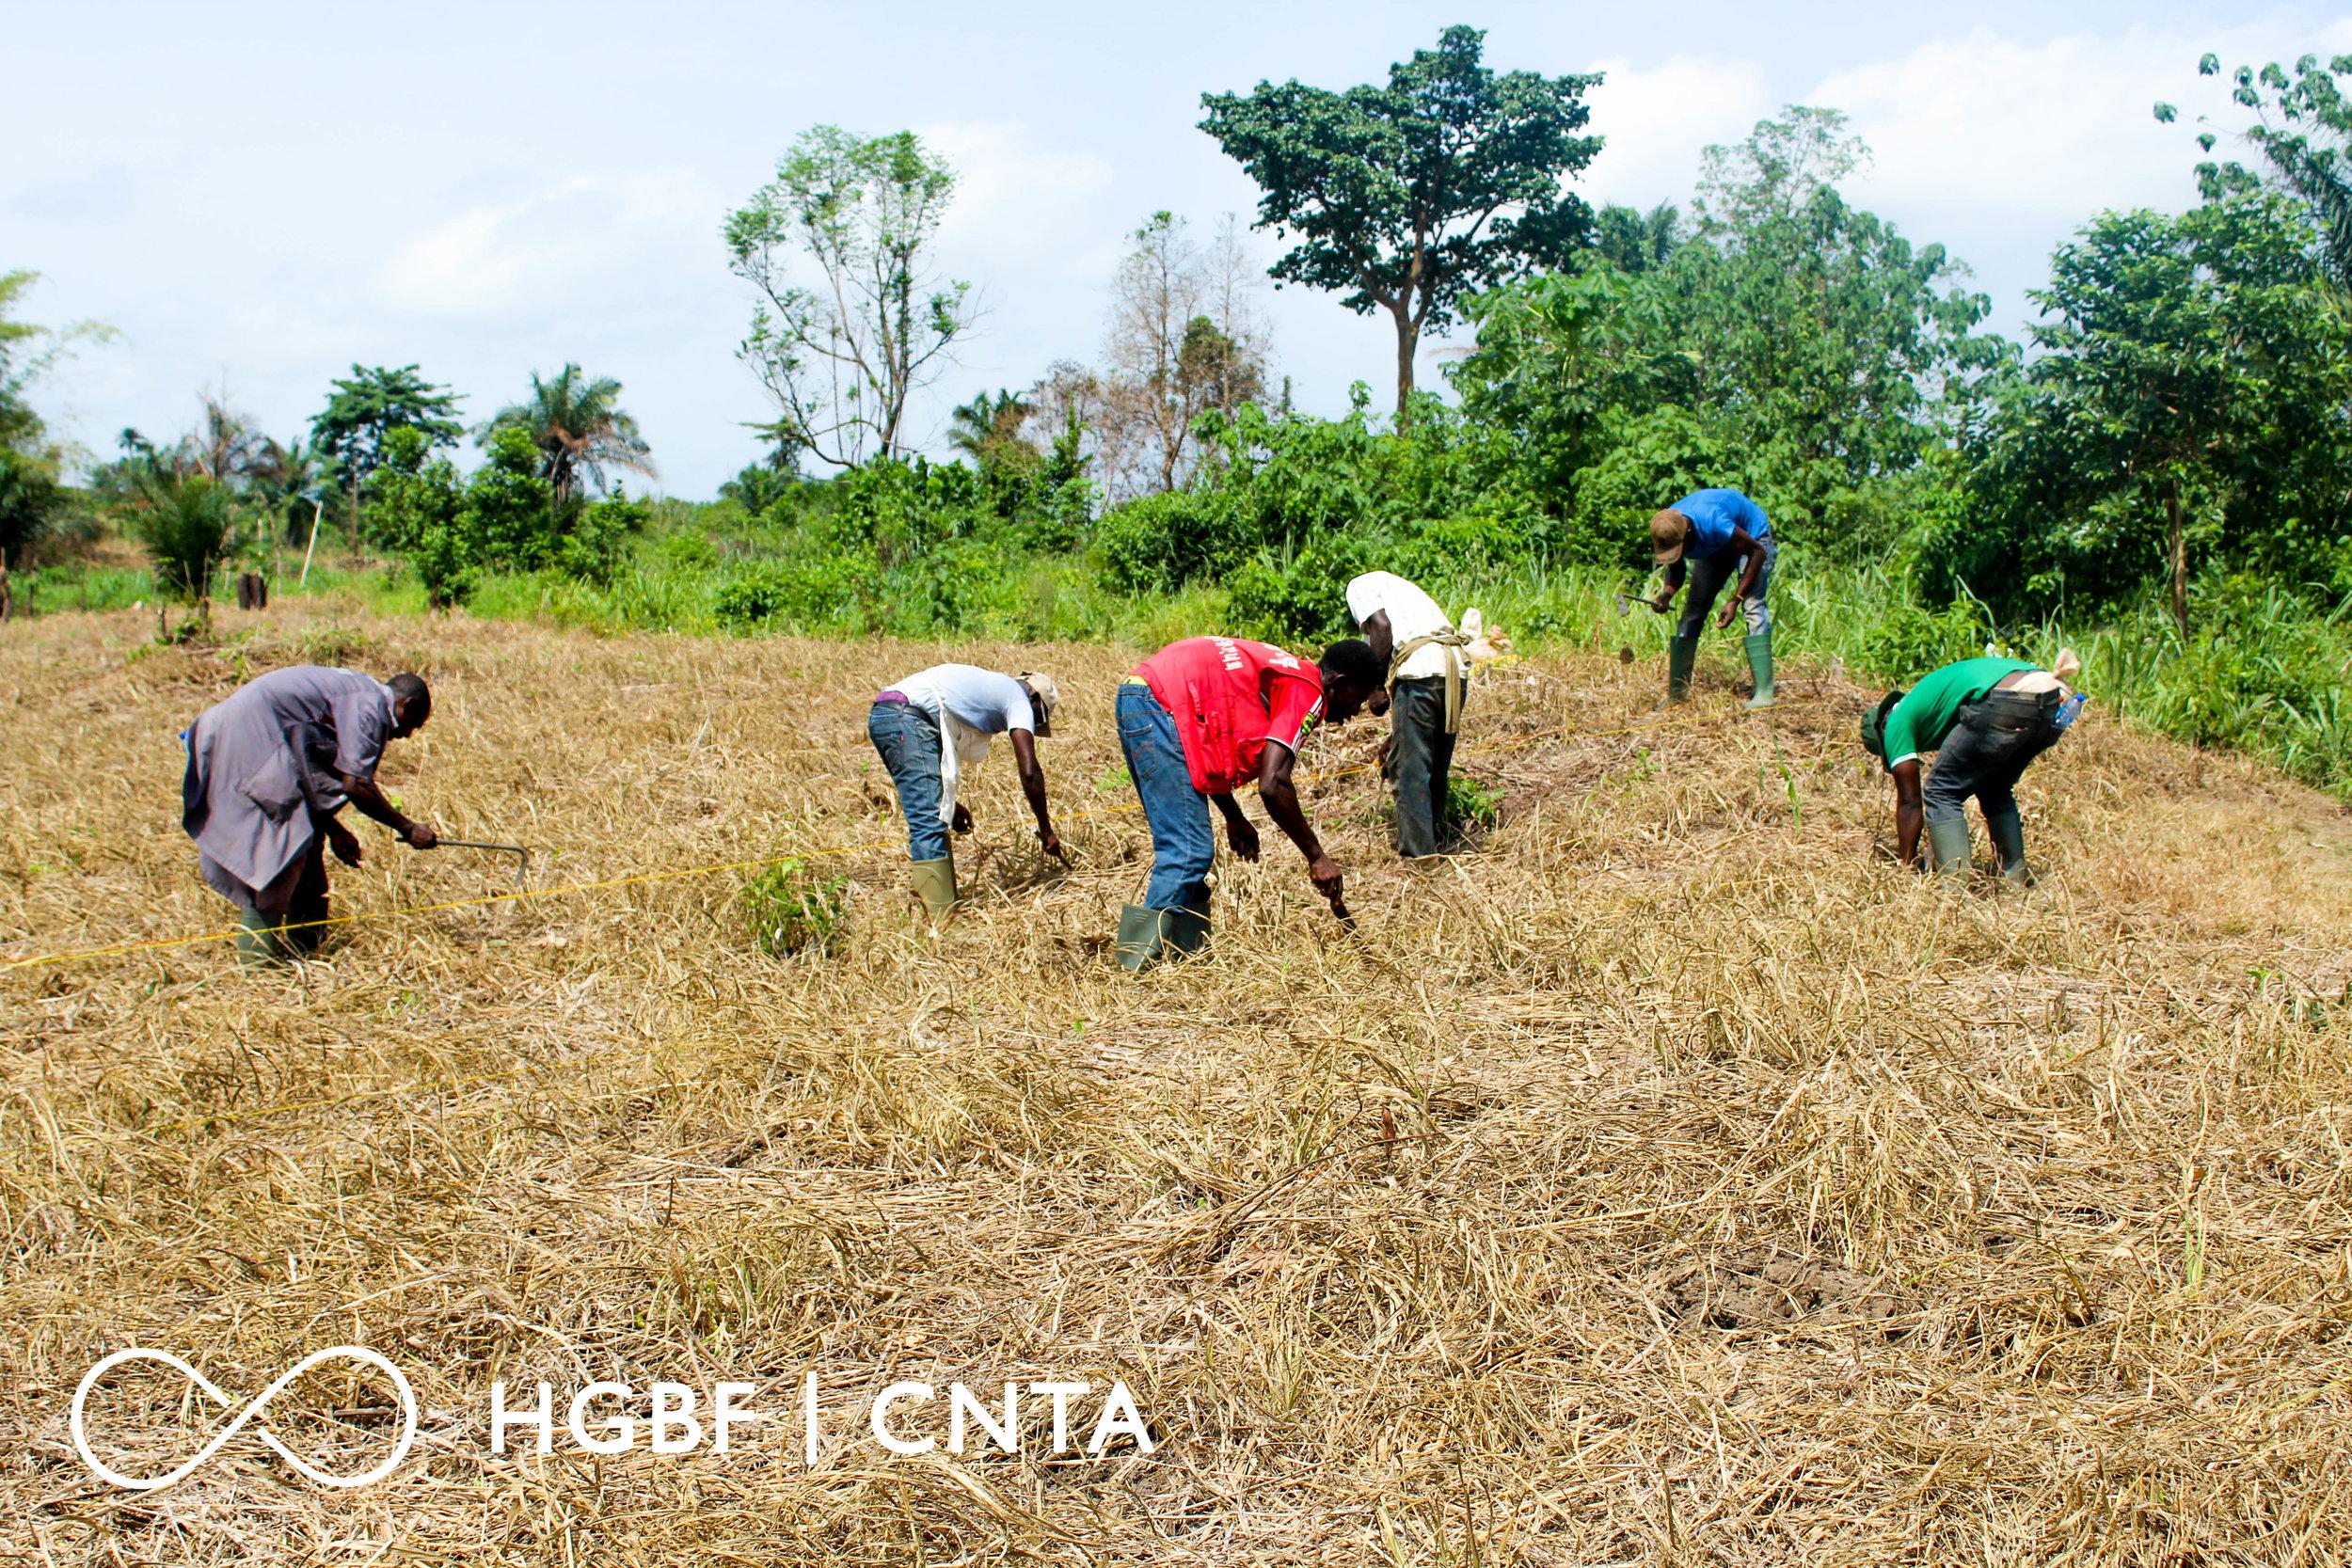 TEAM HGBF|CNTA ASSISTING A FARMER